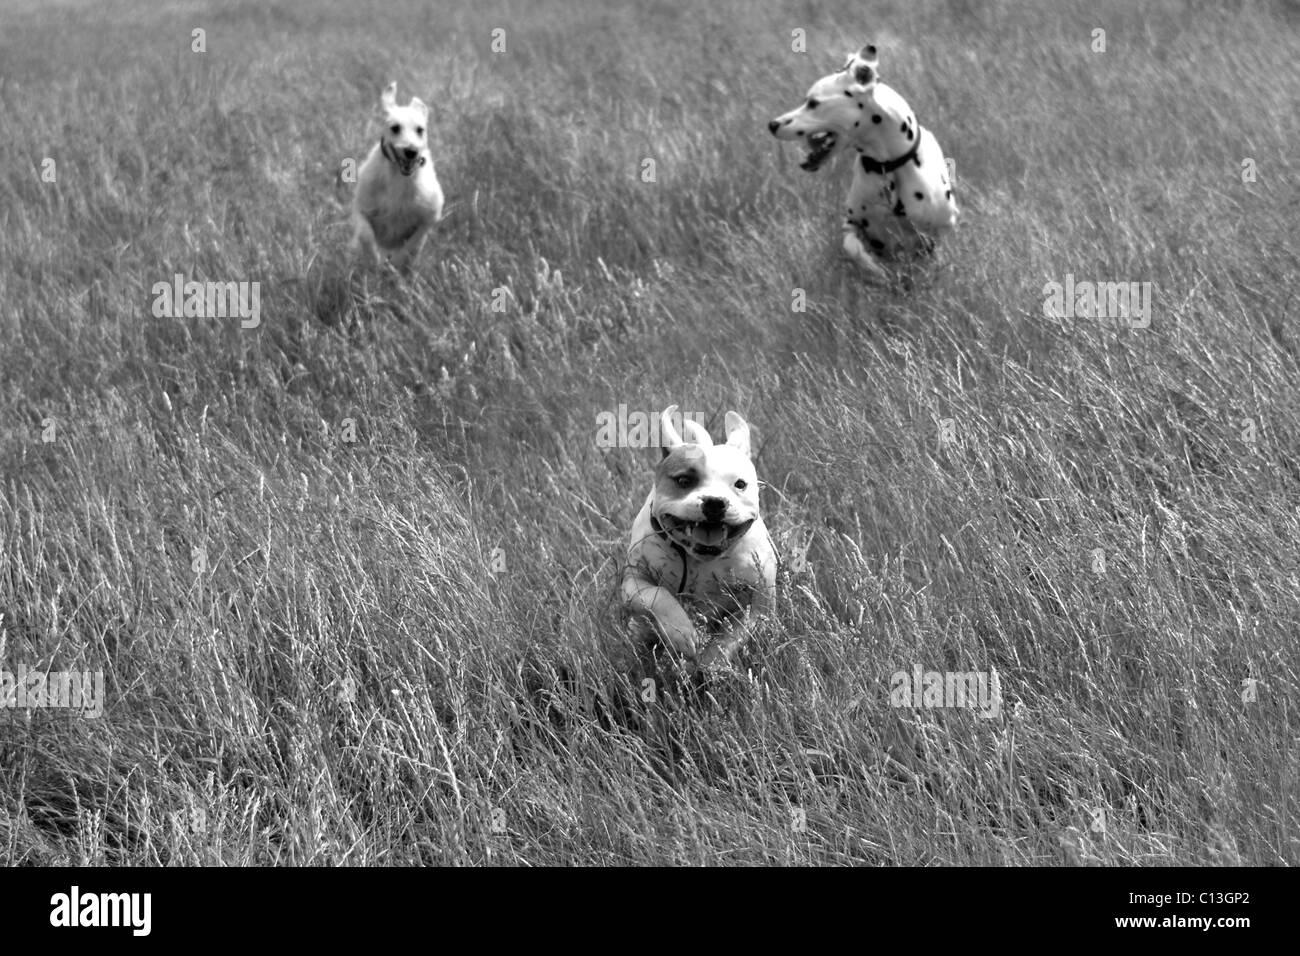 Three dogs running through long grass - Stock Image